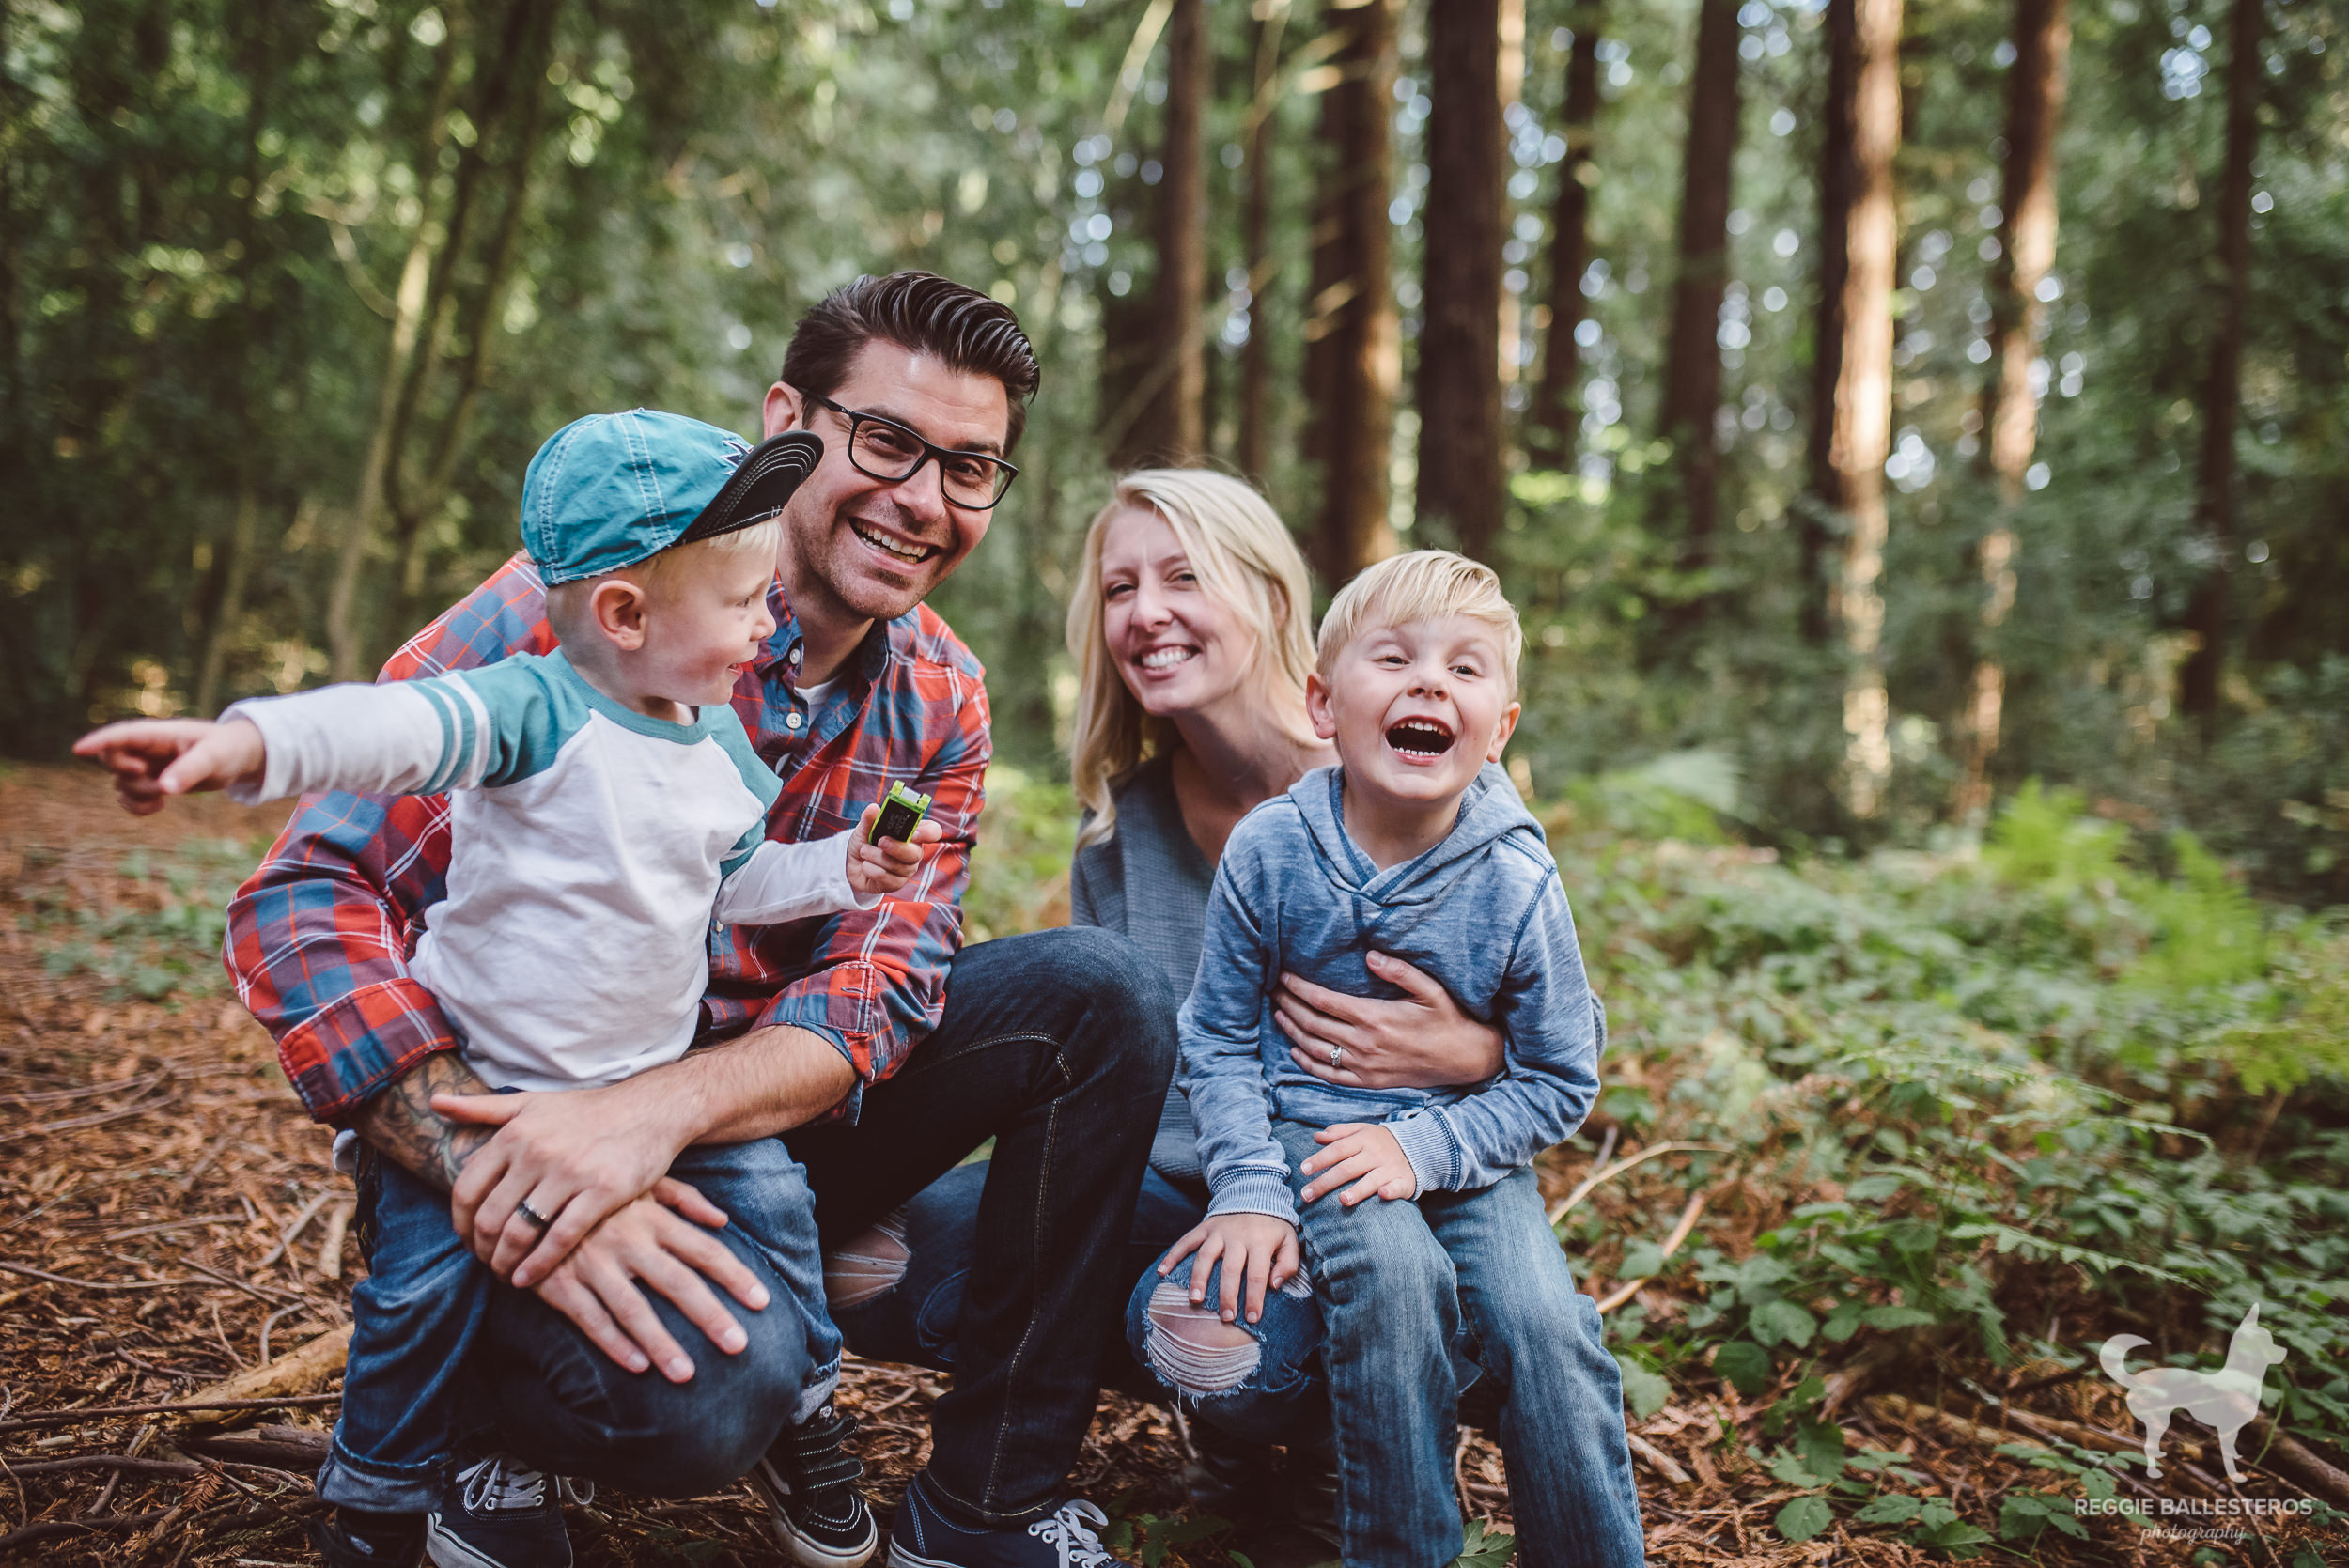 Joaquin-Miller-Park-Oakland-Family-Photography-033.jpg